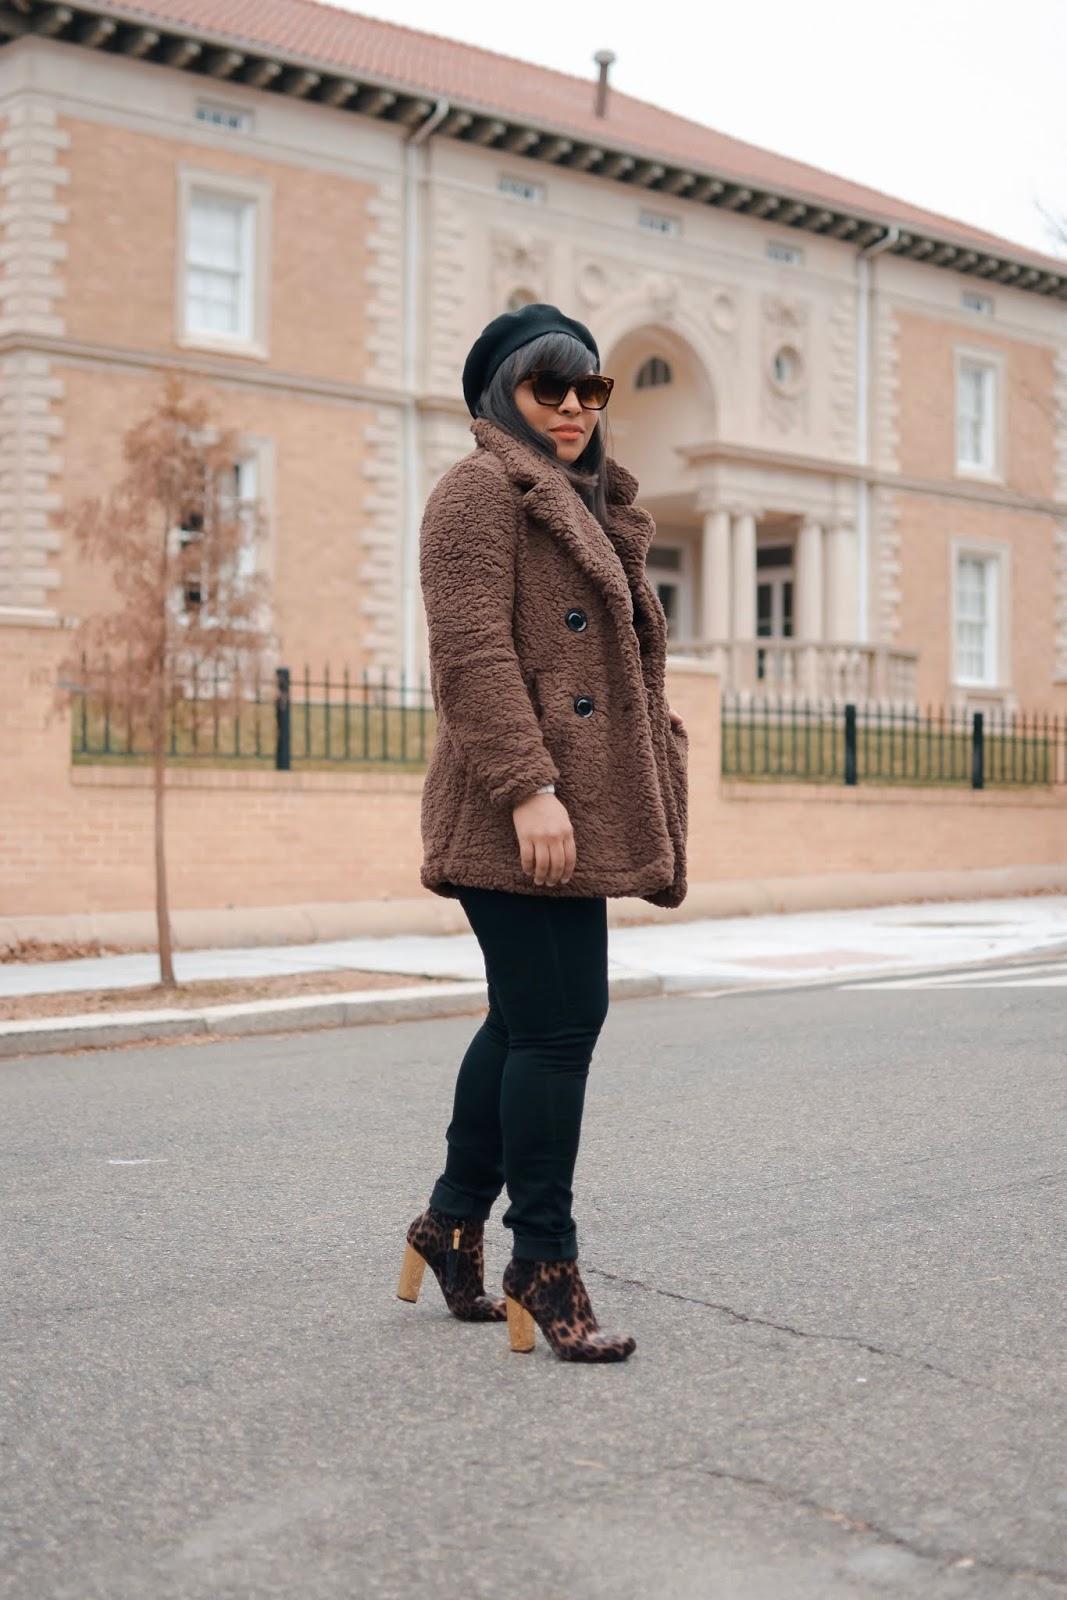 teddy bear coat trend, teddy coat, pixir coat, mom bloggers, fashionble moms, trendy moms, streetstyle